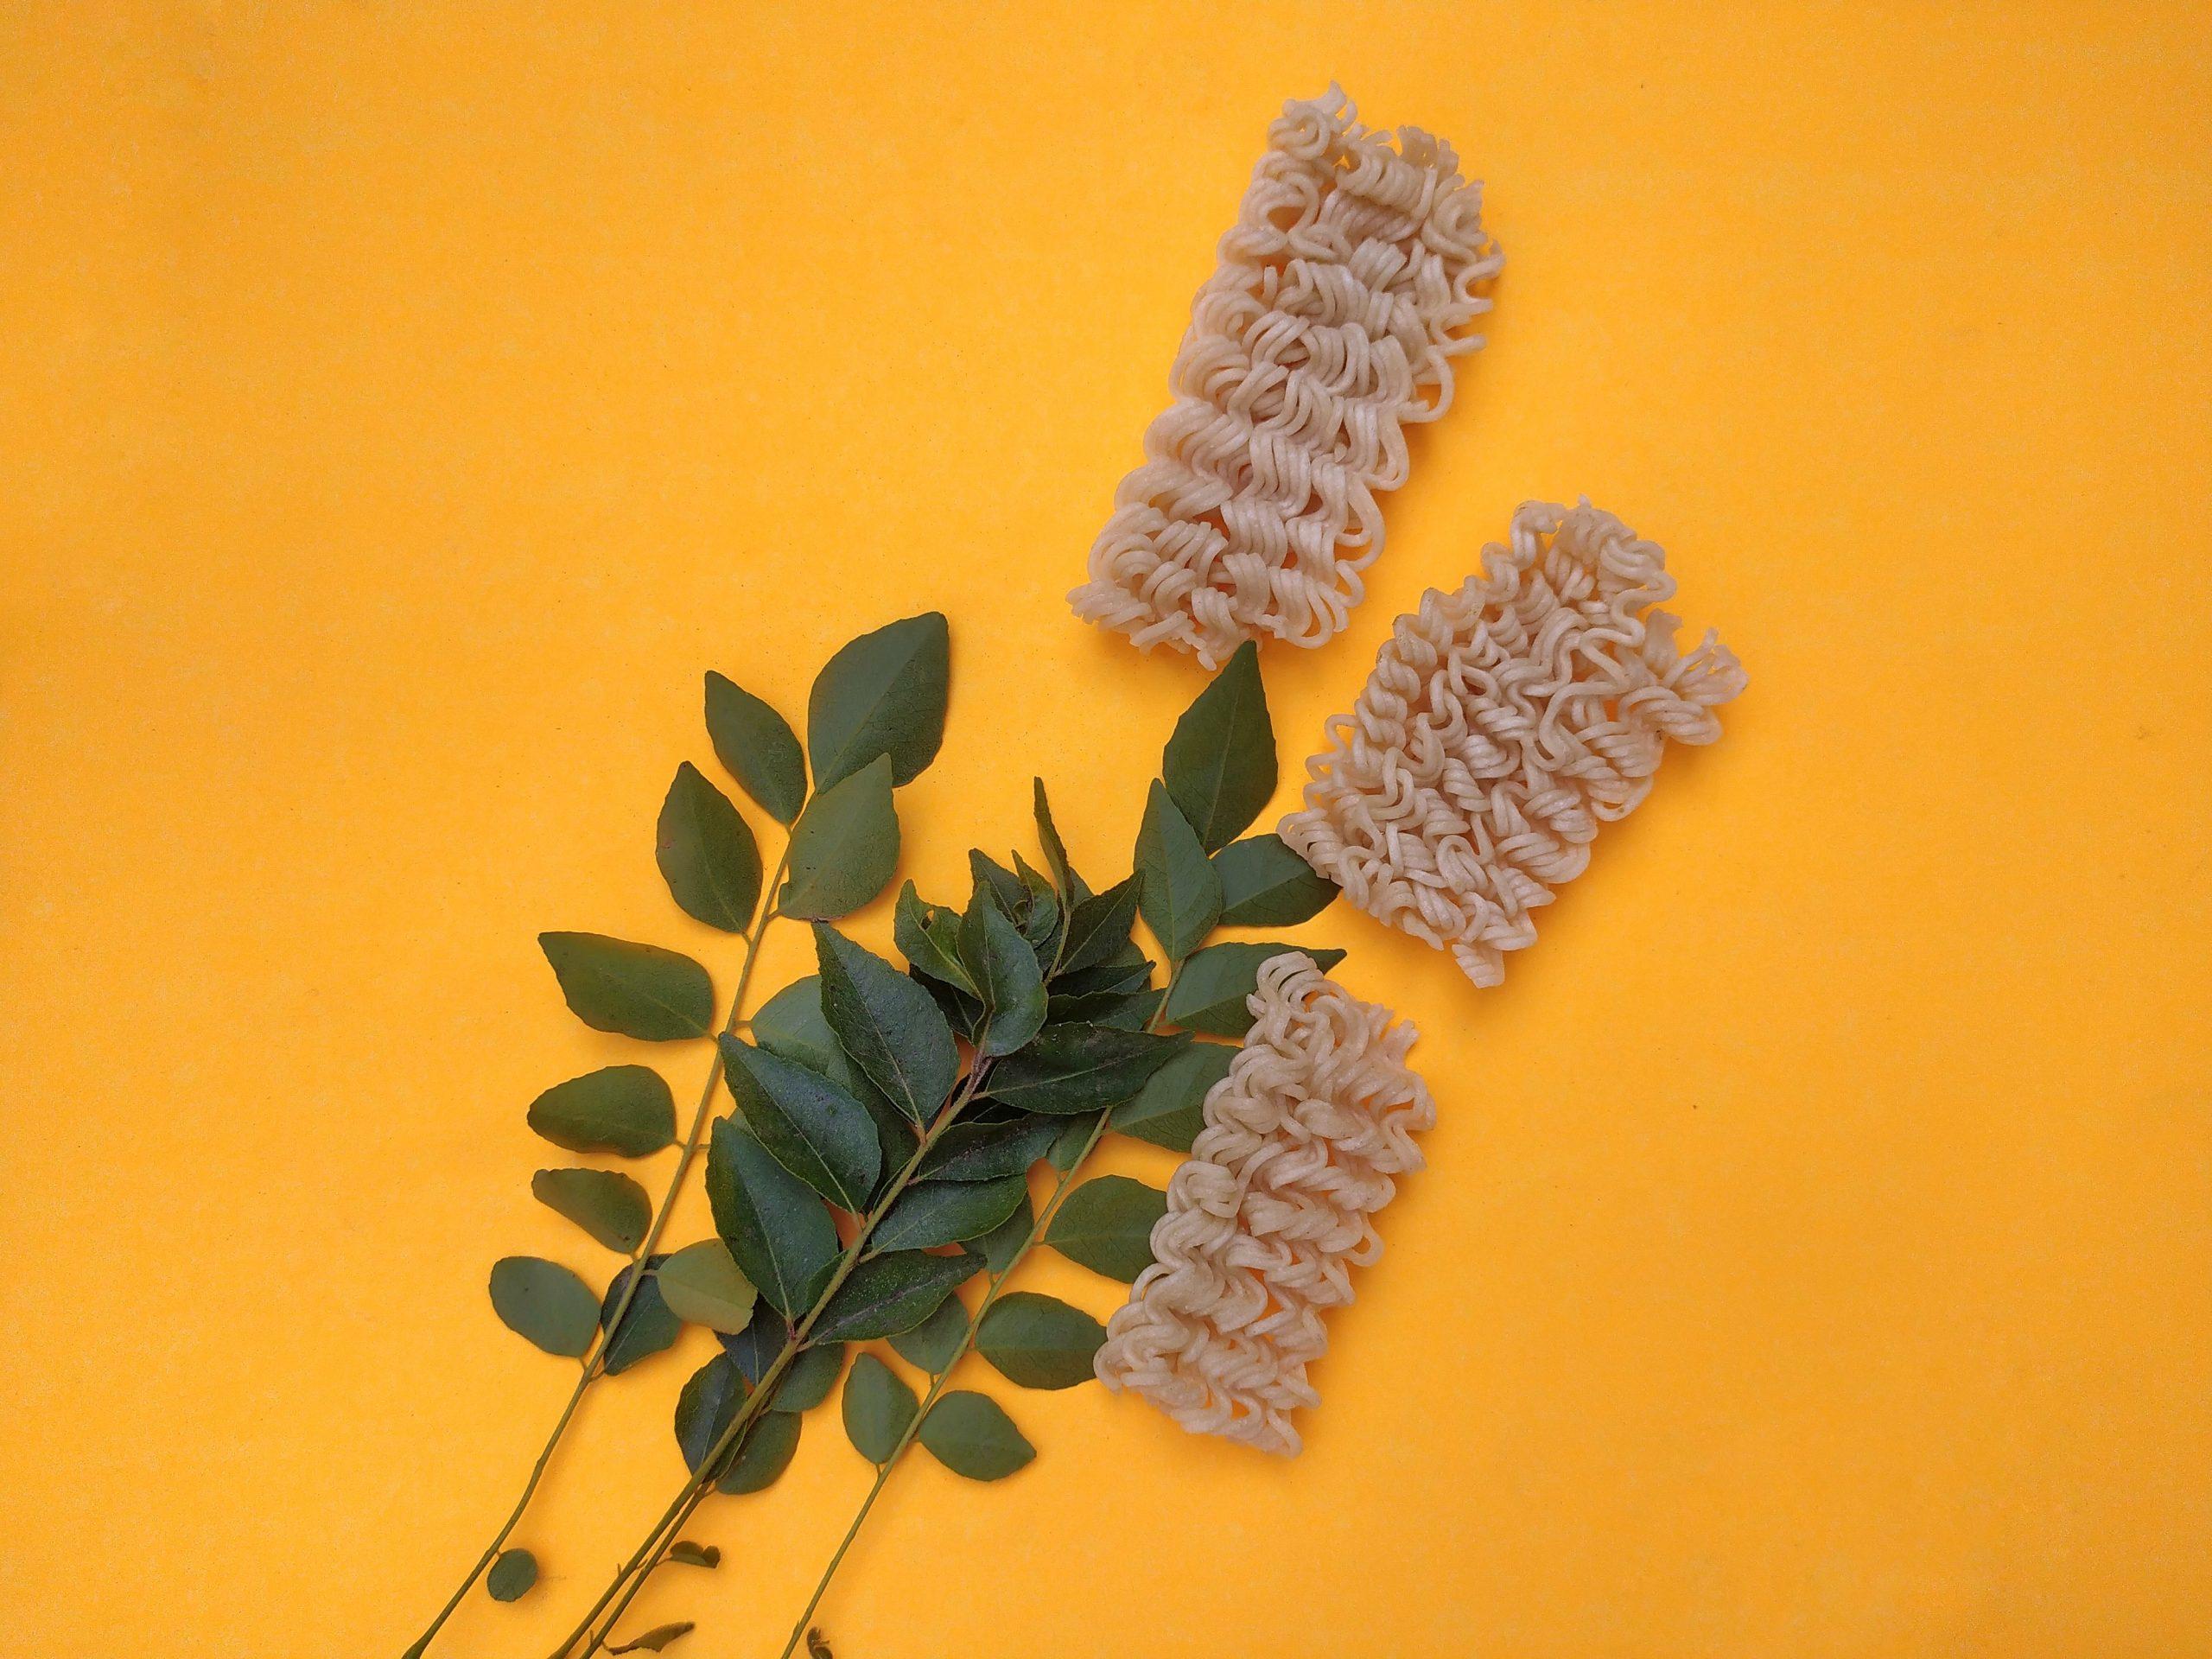 Noodles and Murraya koenigii leaves